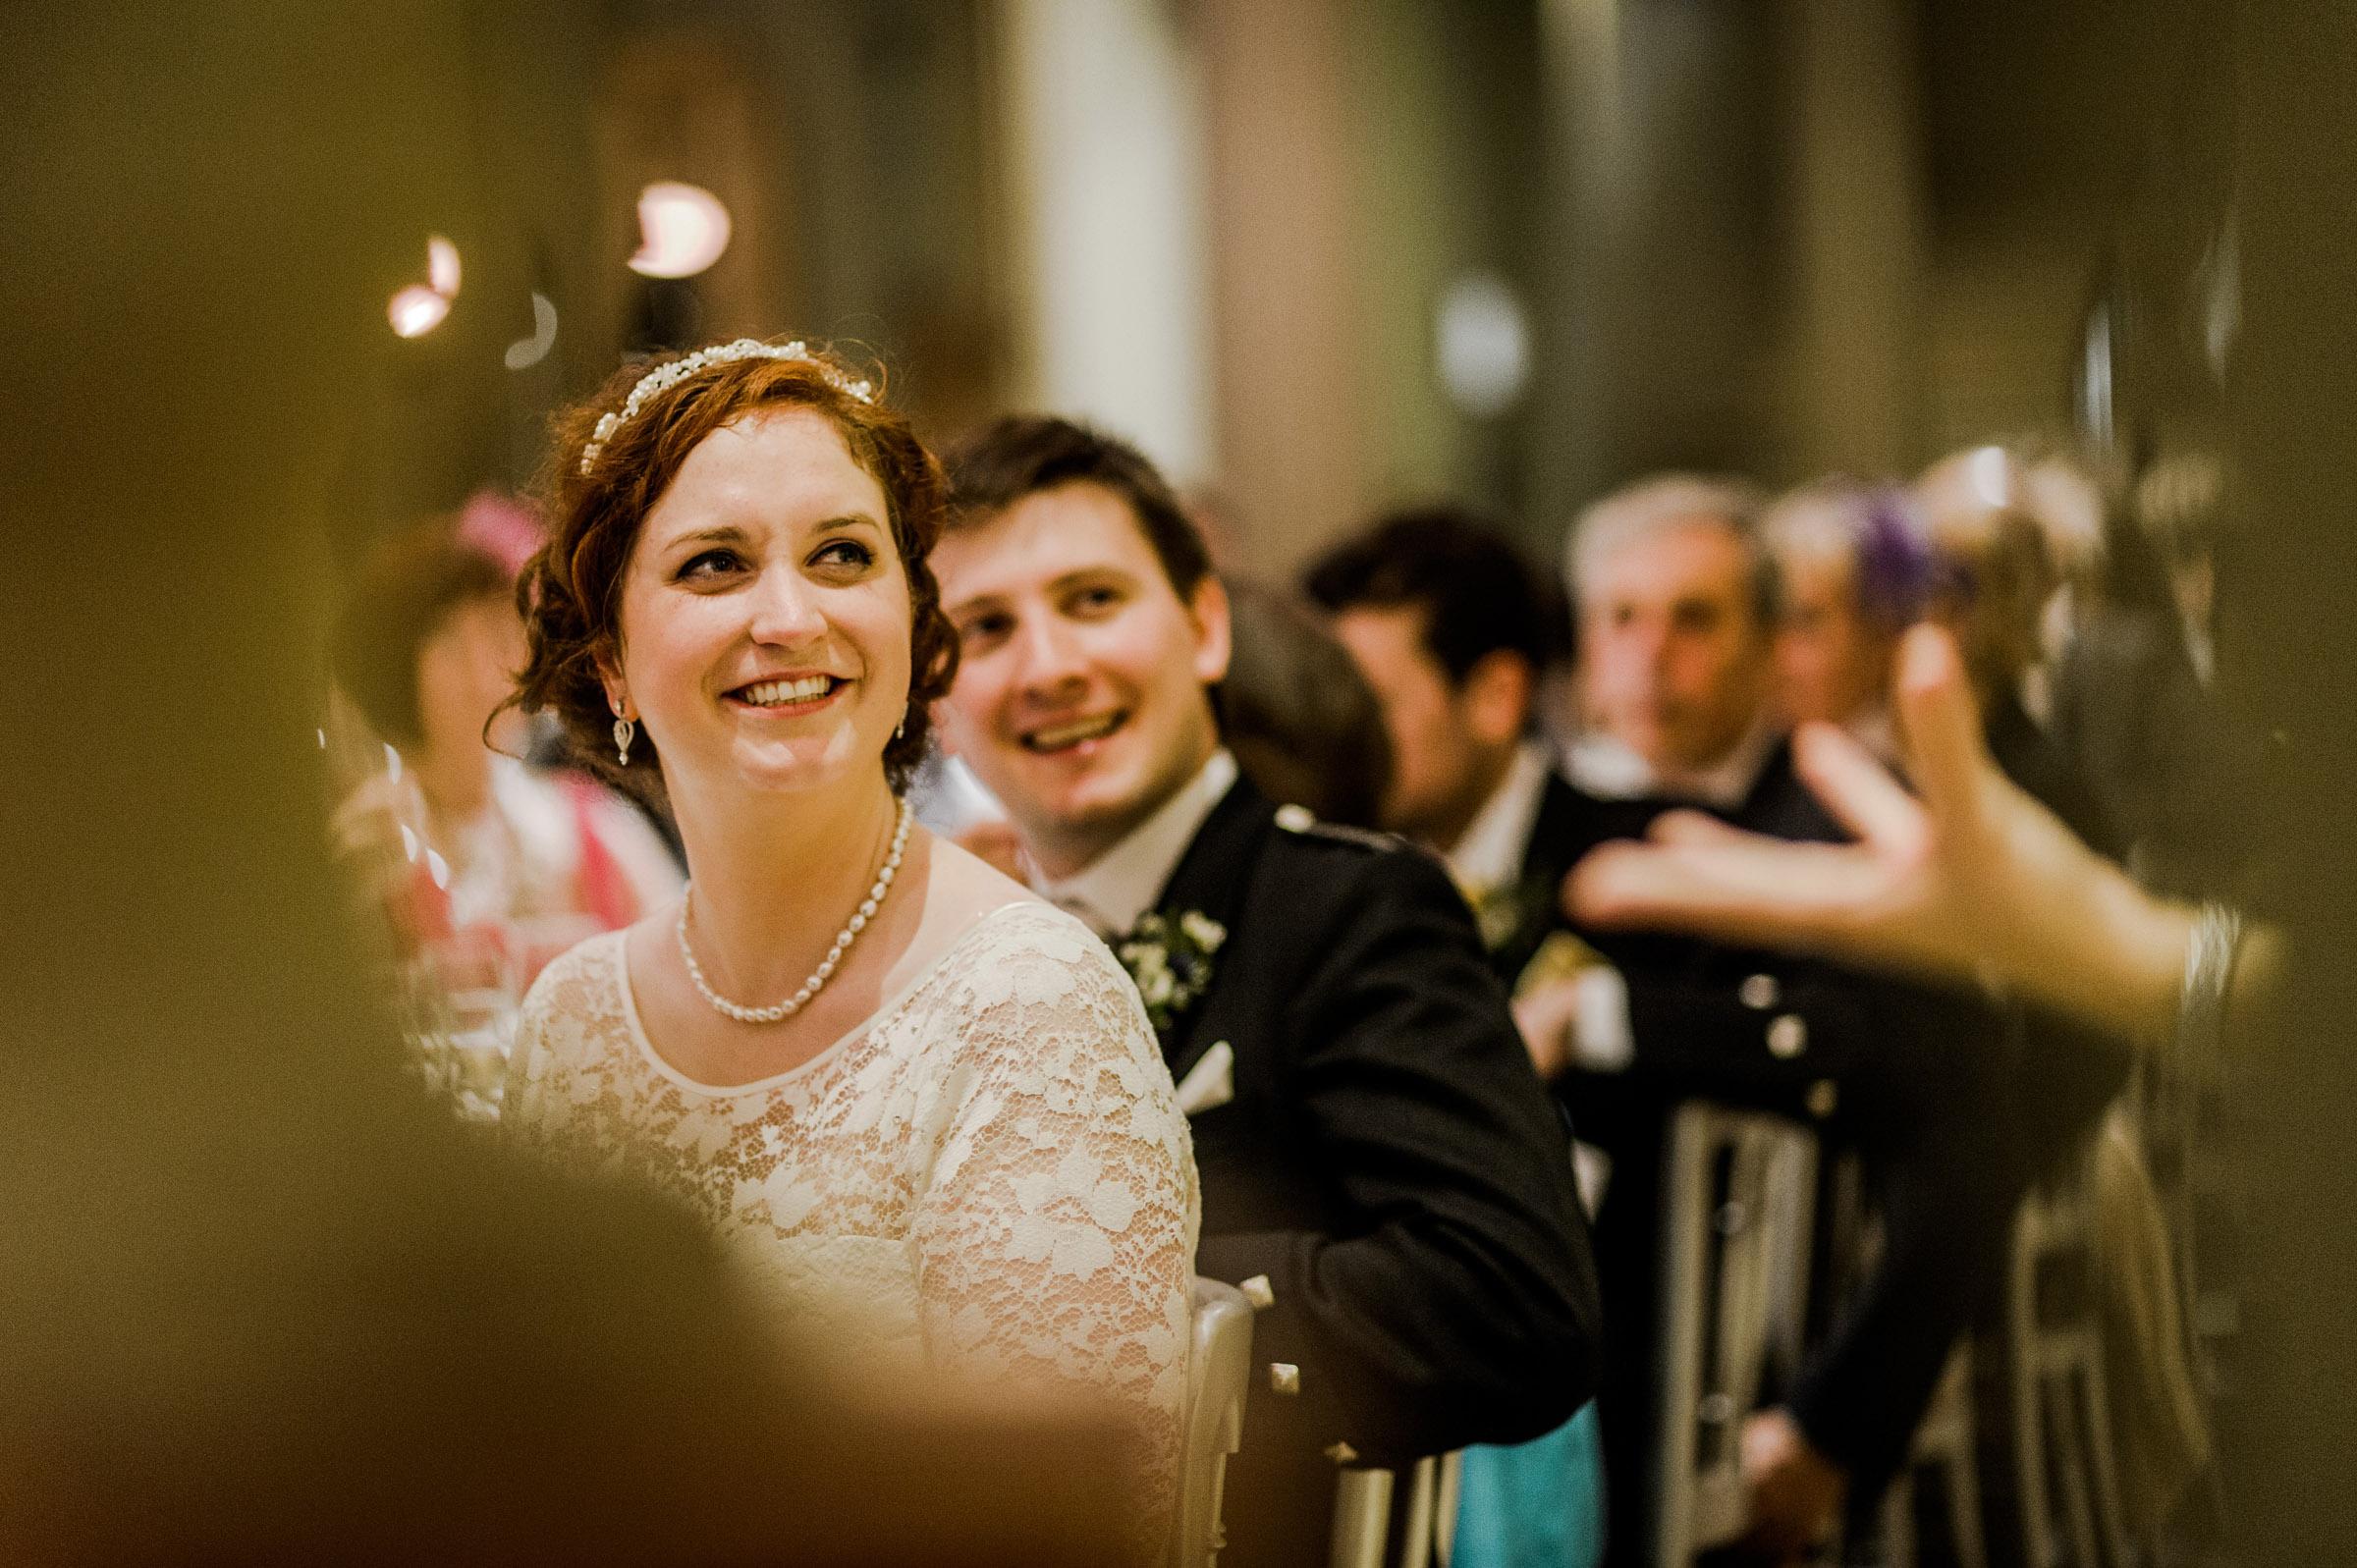 Ashmolean-Museum-Wedding-Pictures-0058.jpg